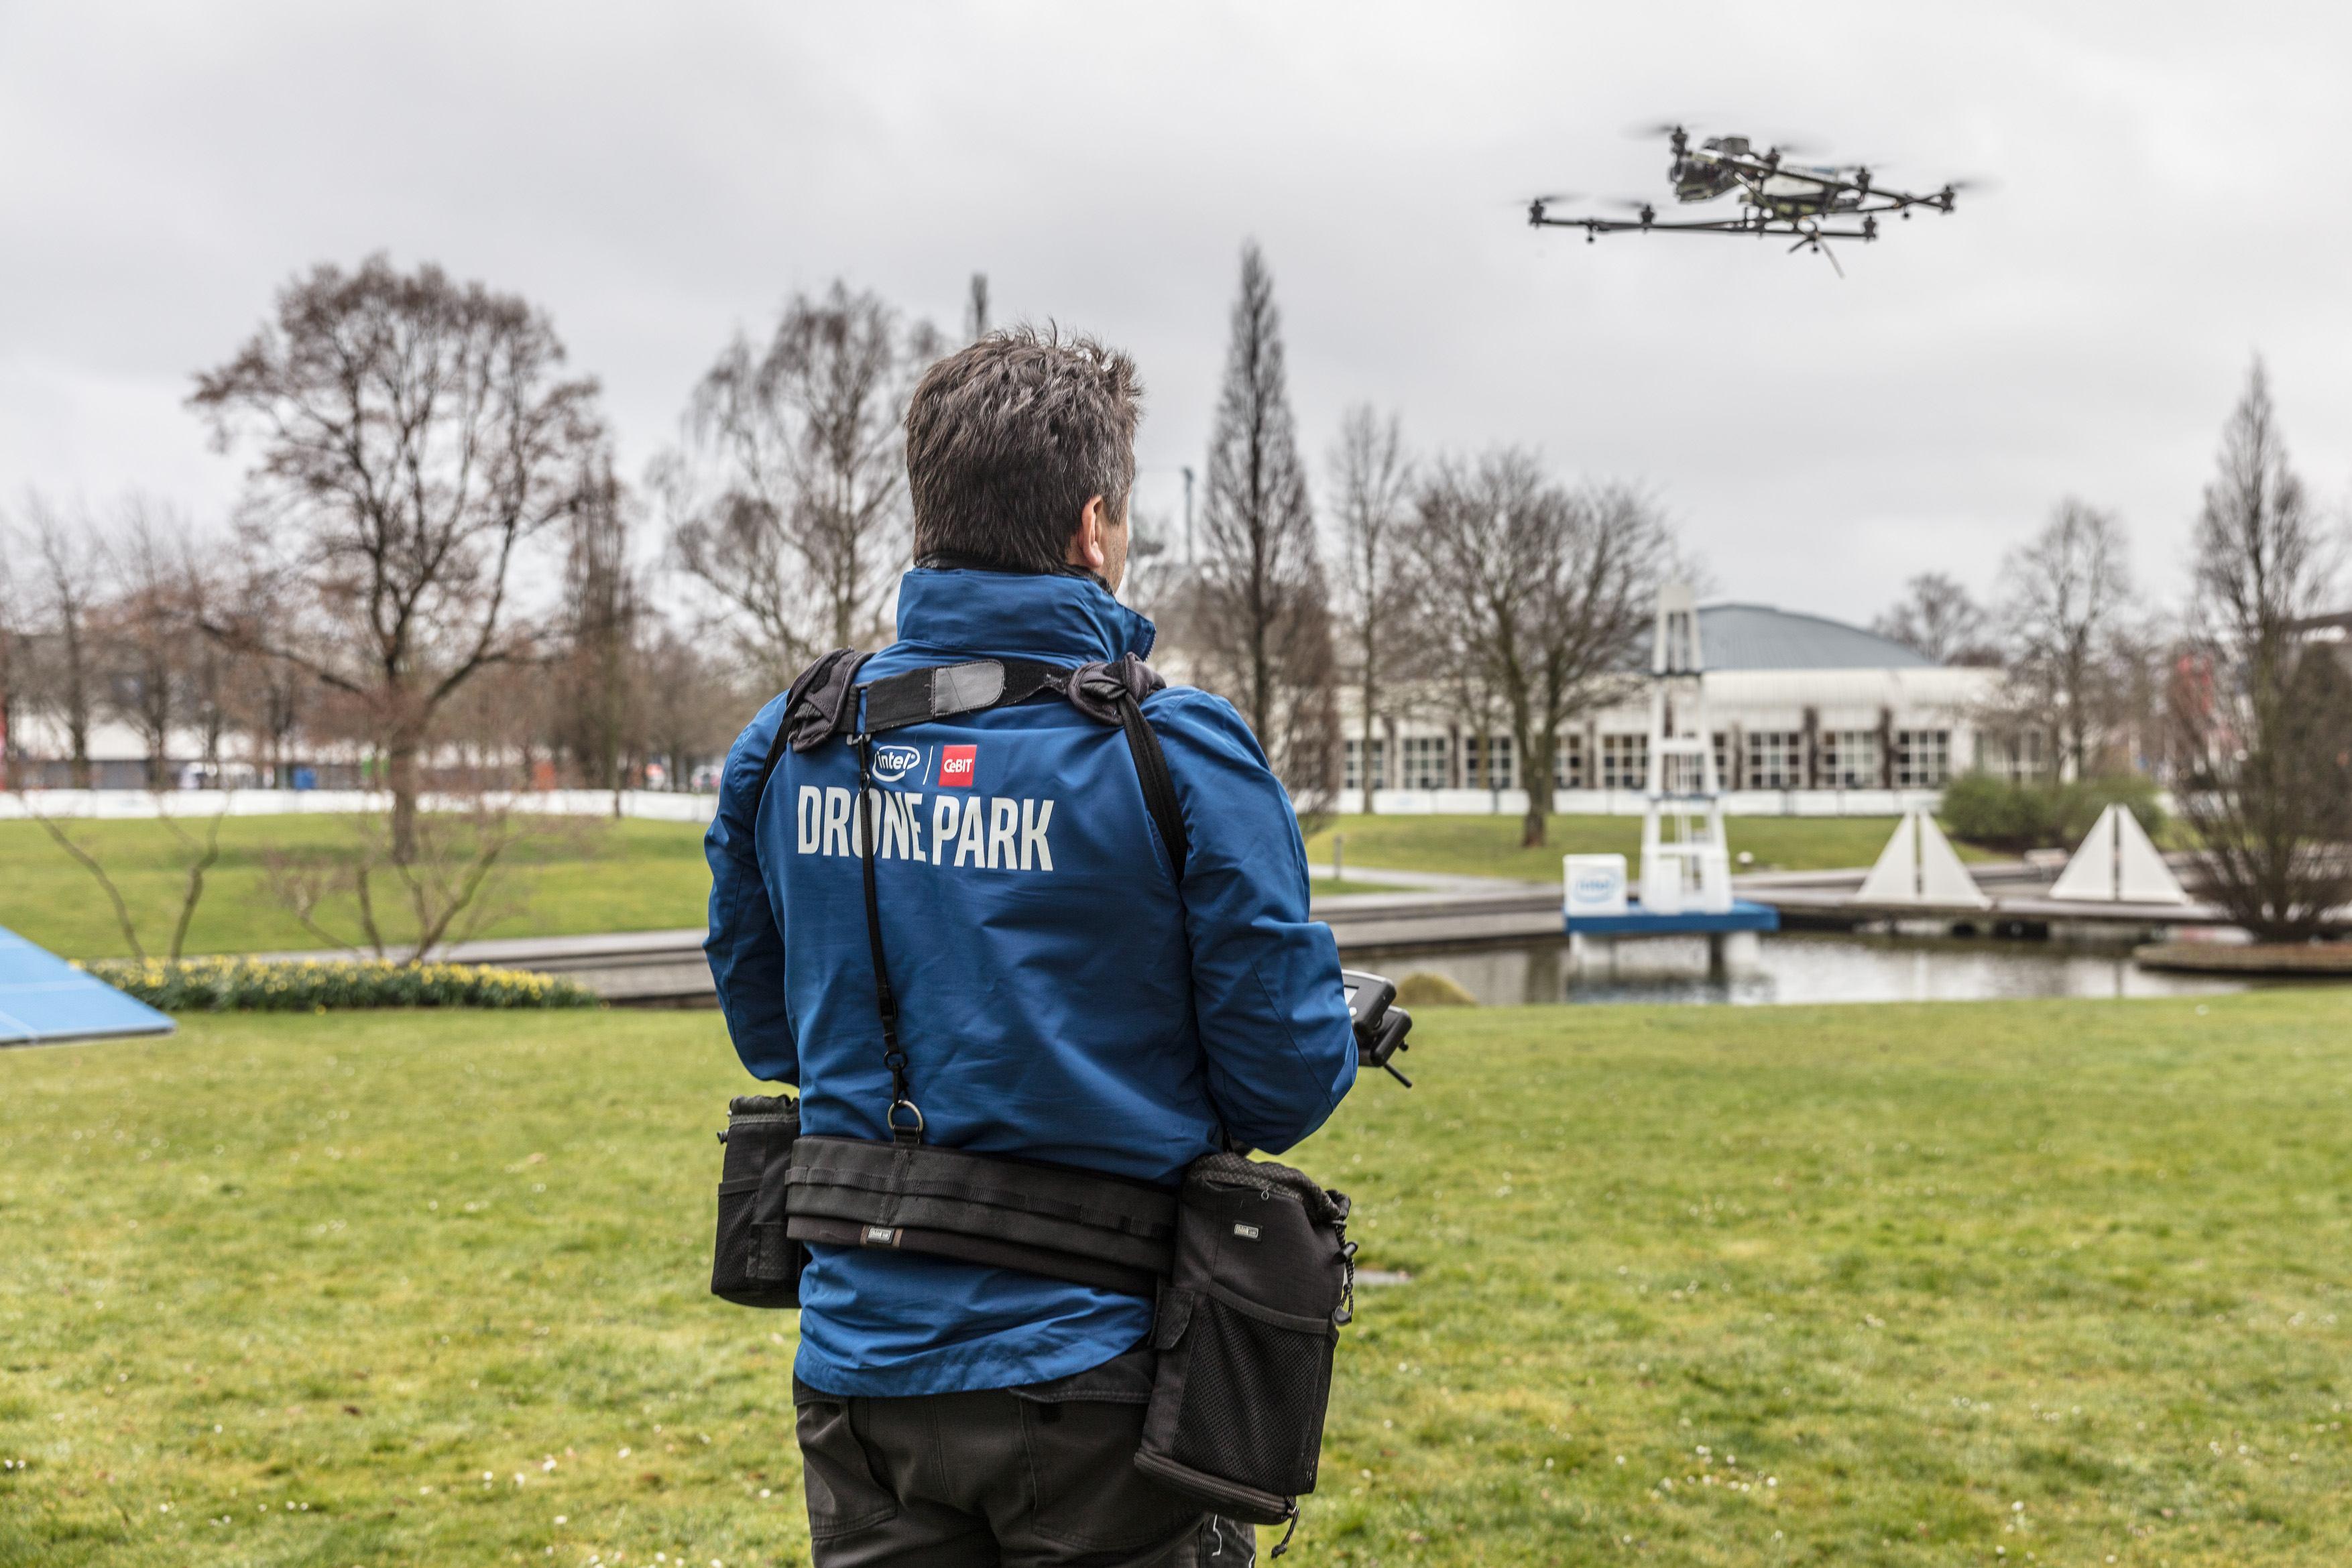 Intel CeBIT Drone Park_1